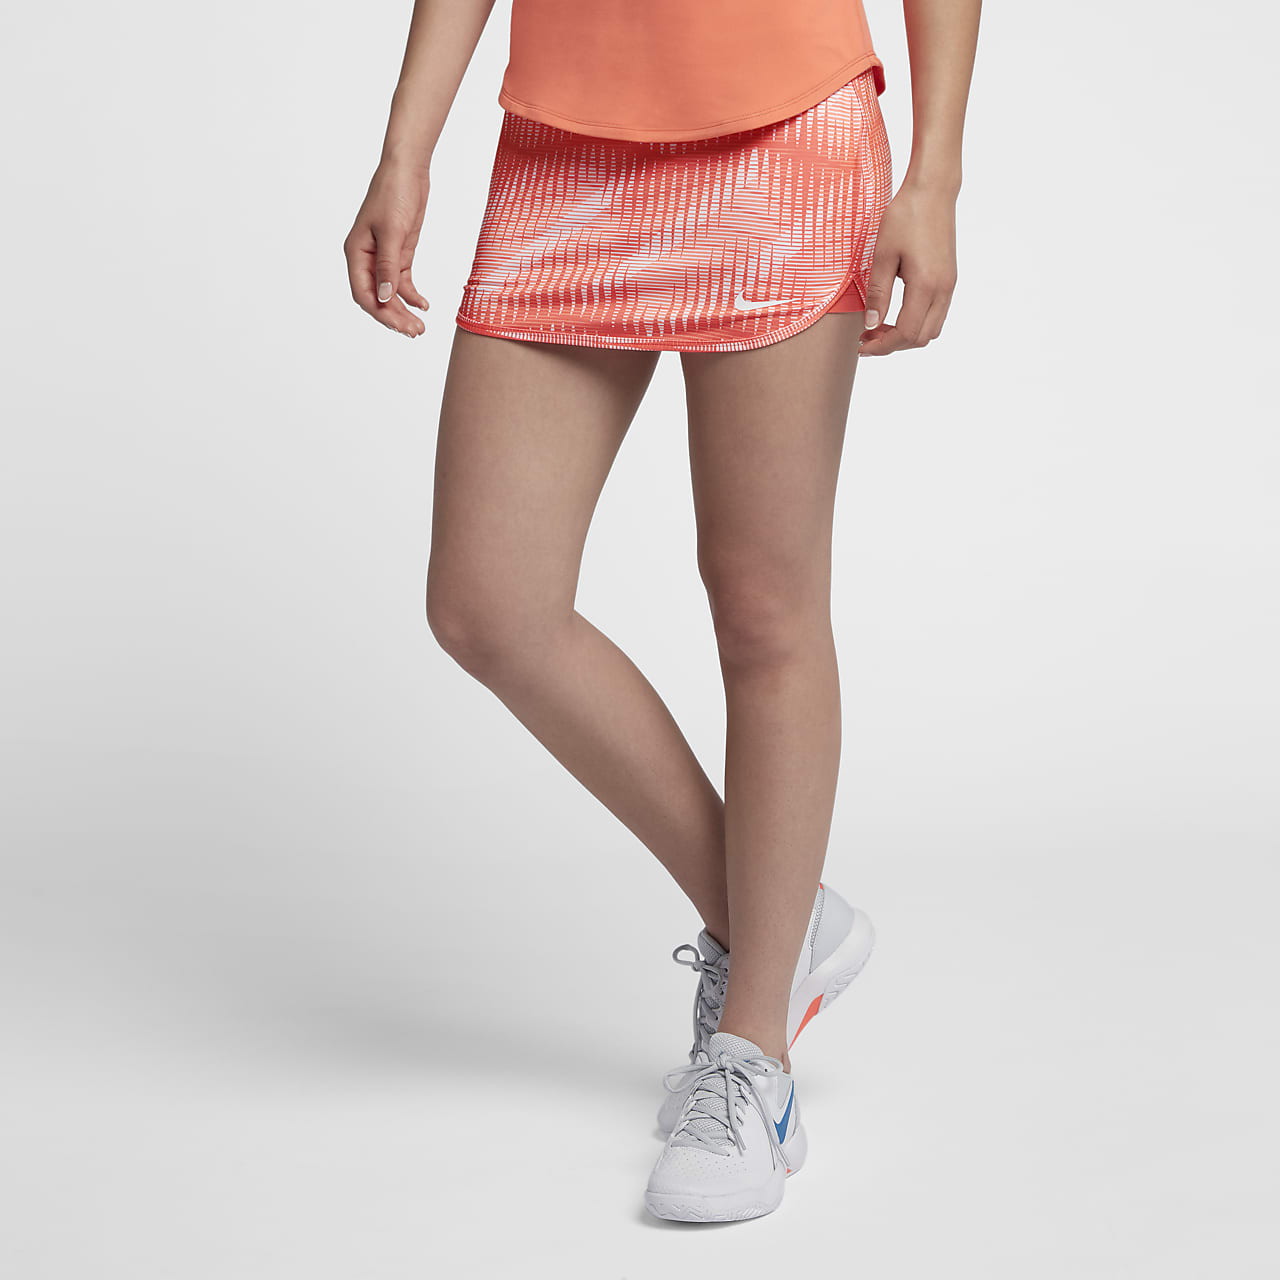 NikeCourt Pure Women's Tennis Skirt